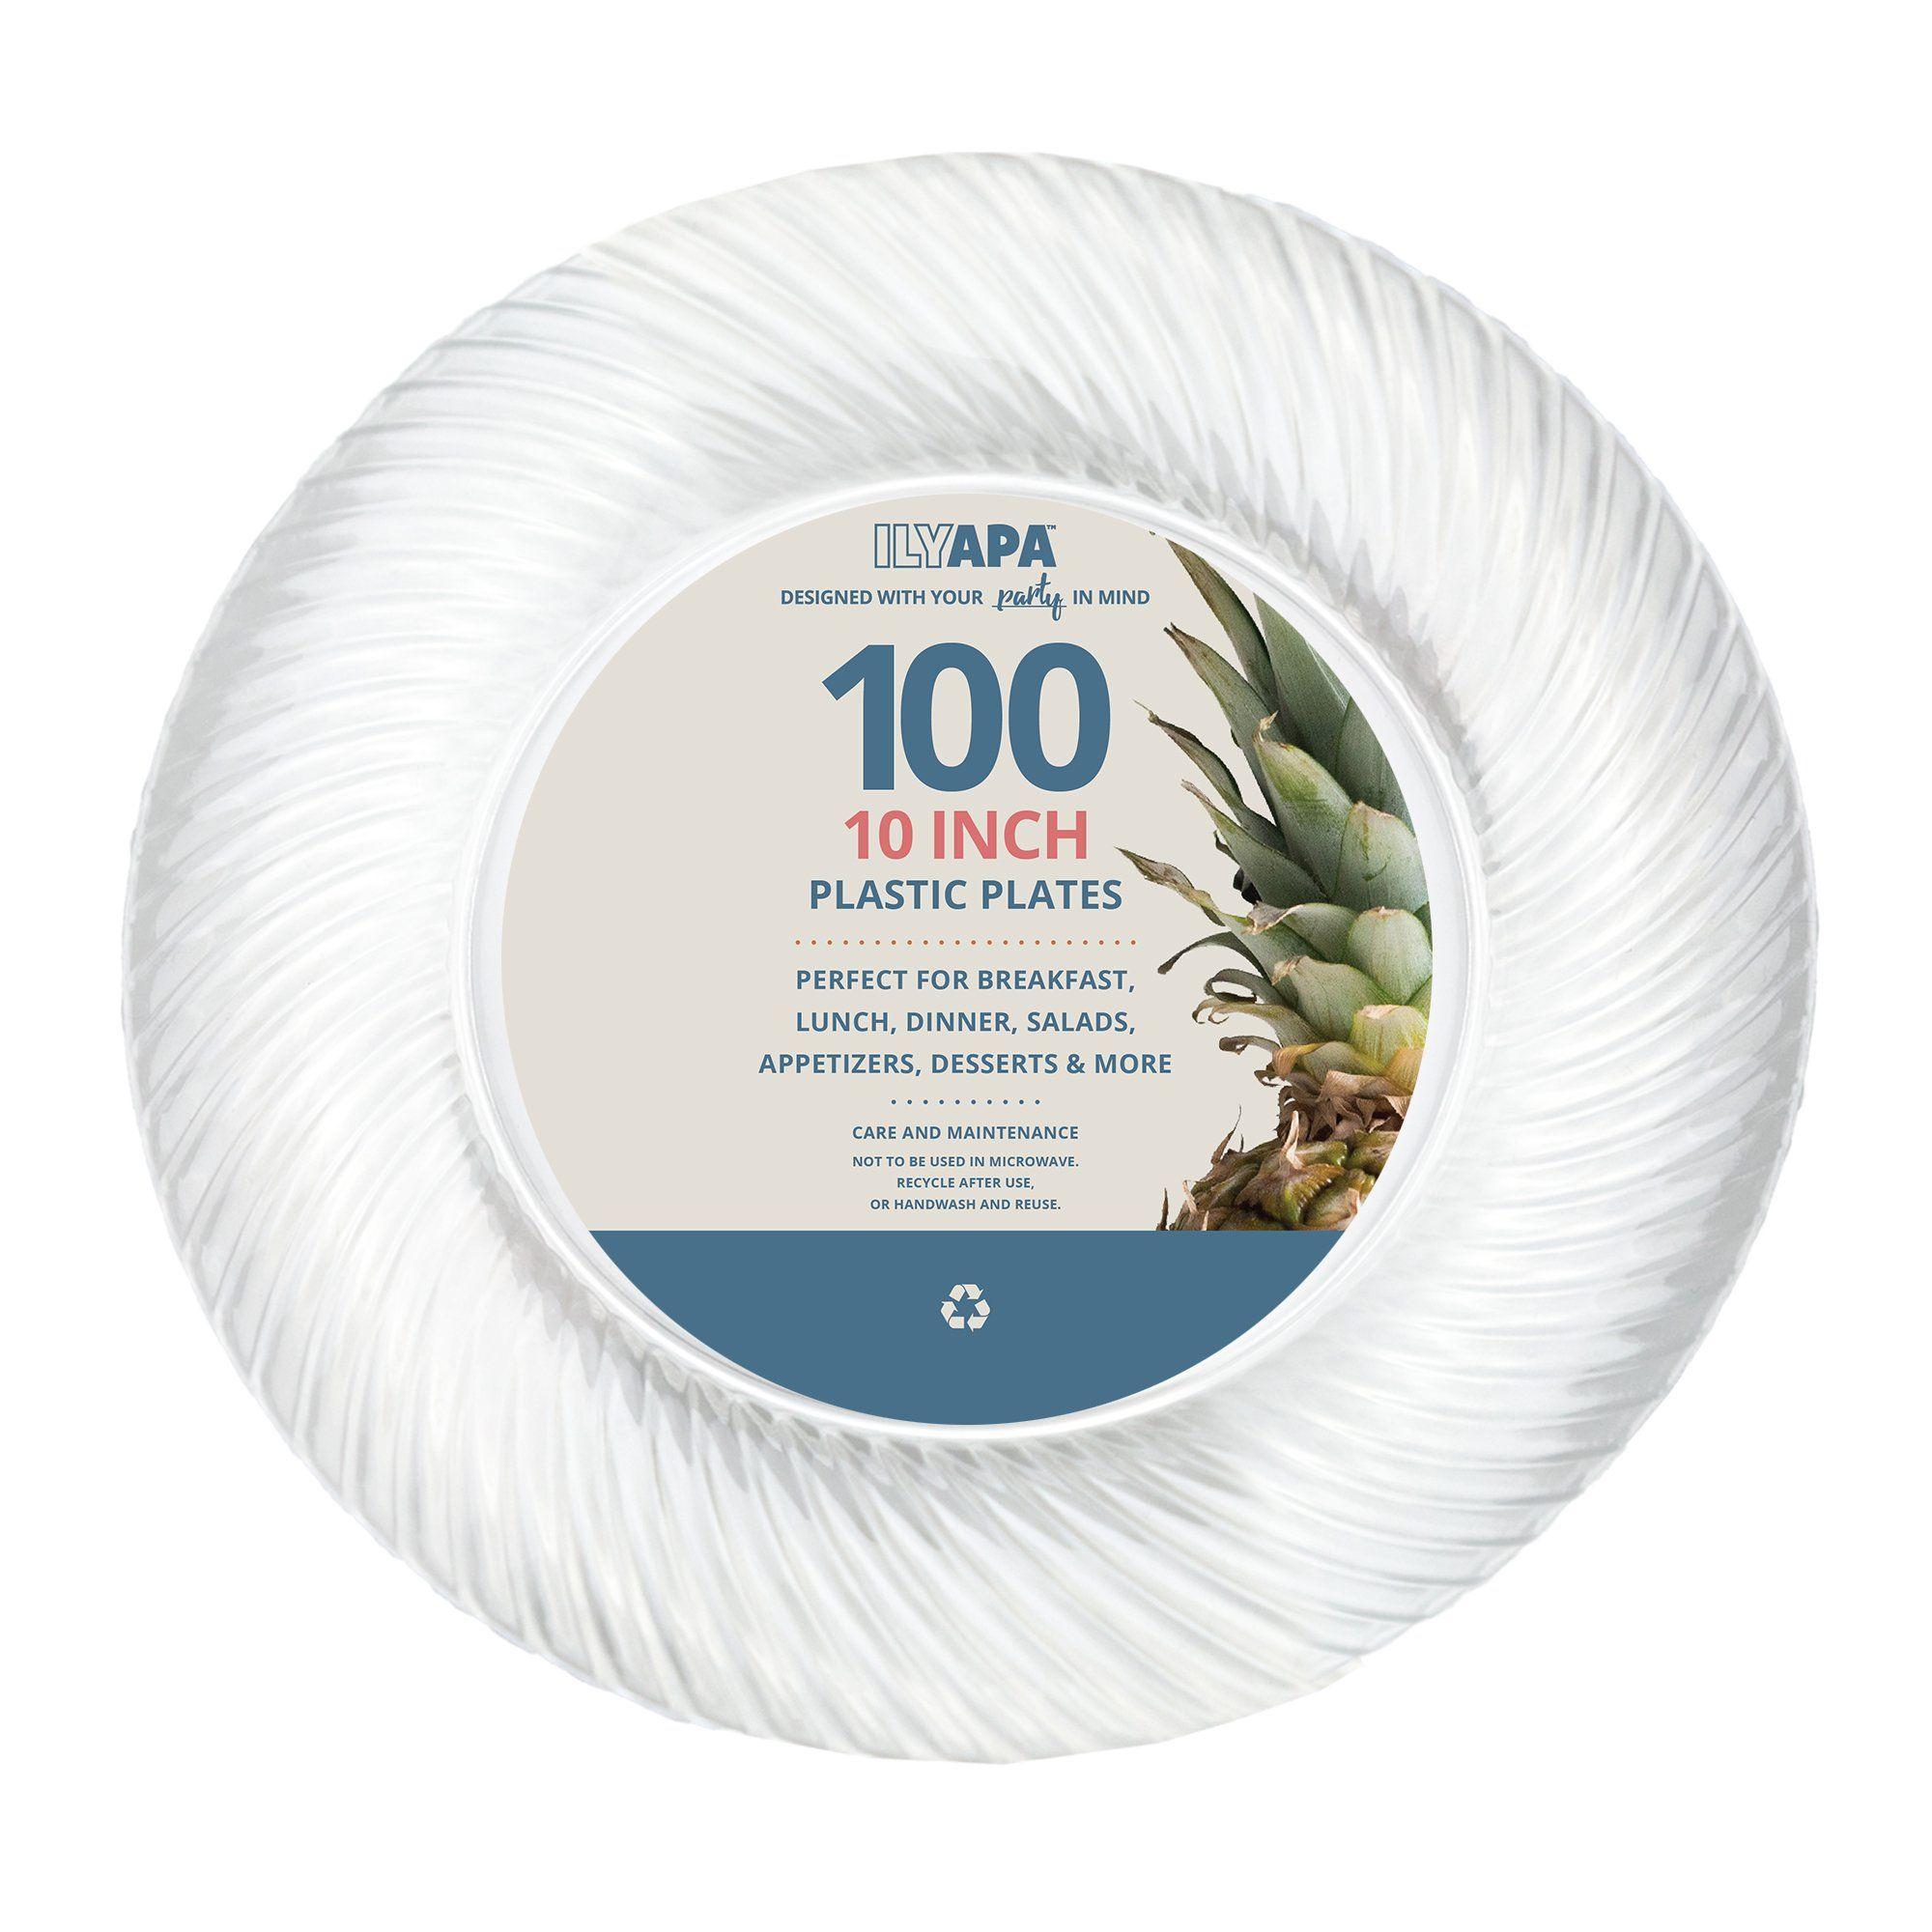 100 Premium Clear Plastic Plates For Dinner Party Or Wedding 10 Inch Fancy Disposabl Elegant Plastic Dinnerware Clear Plastic Plates Disposable Plastic Plates